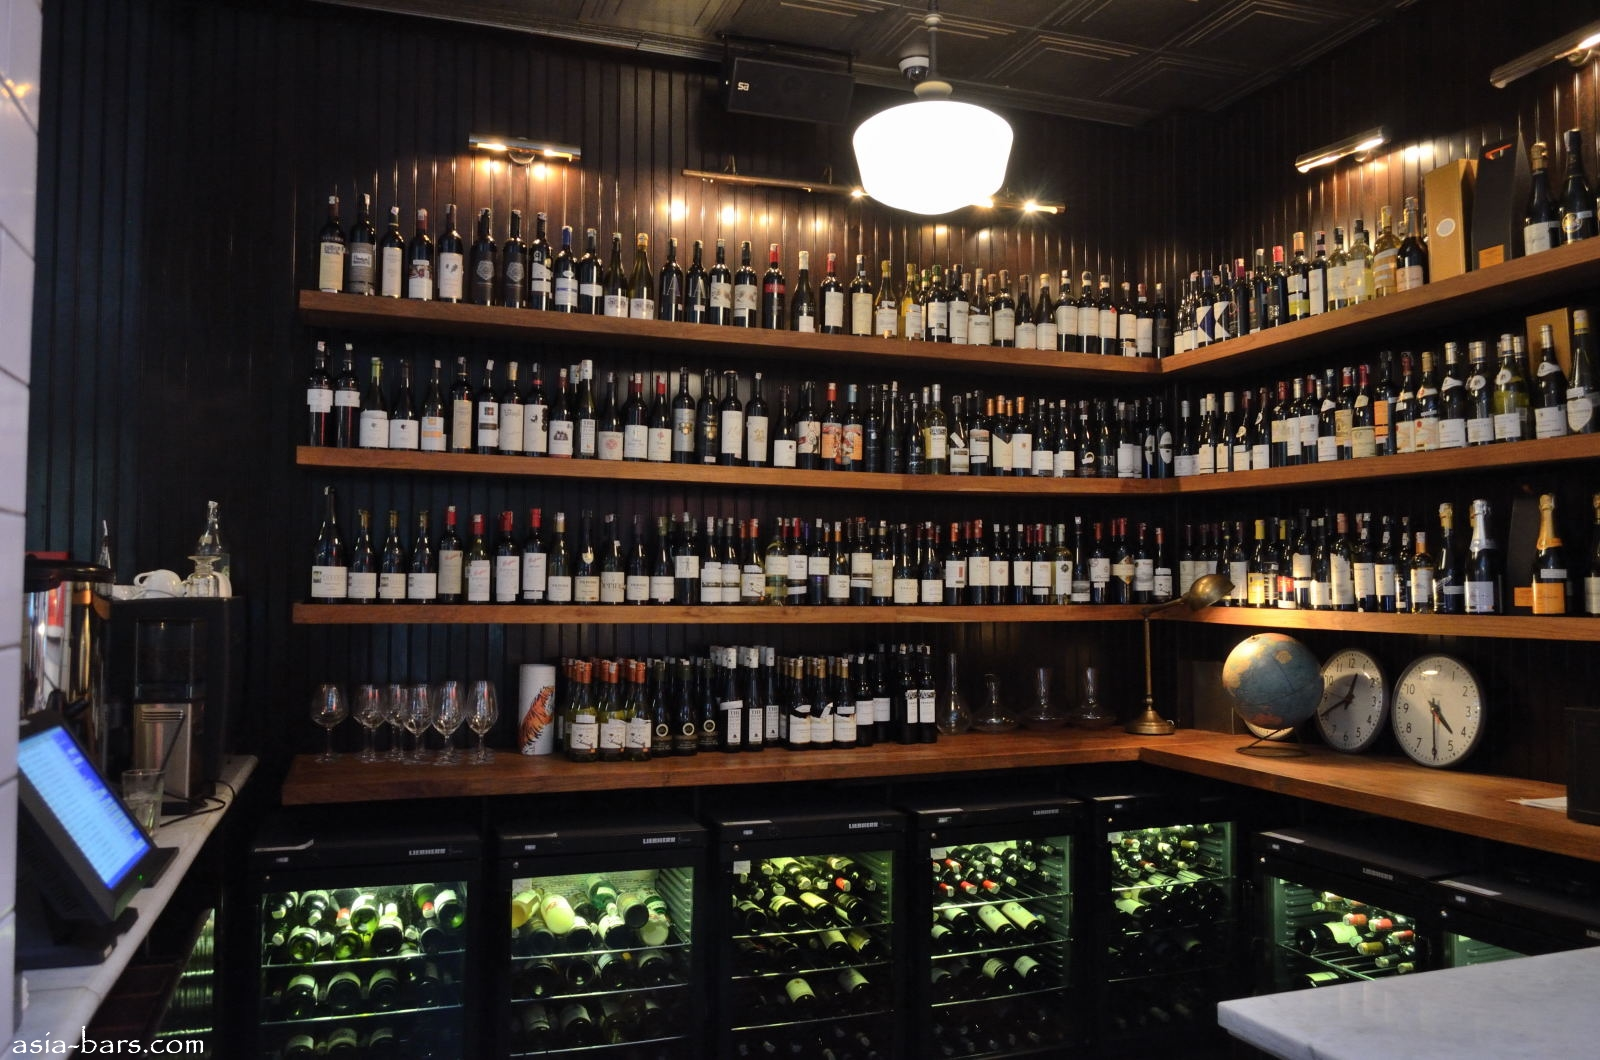 Union brasserie bakery bar celebrated restaurant in for Walk in wine cellars